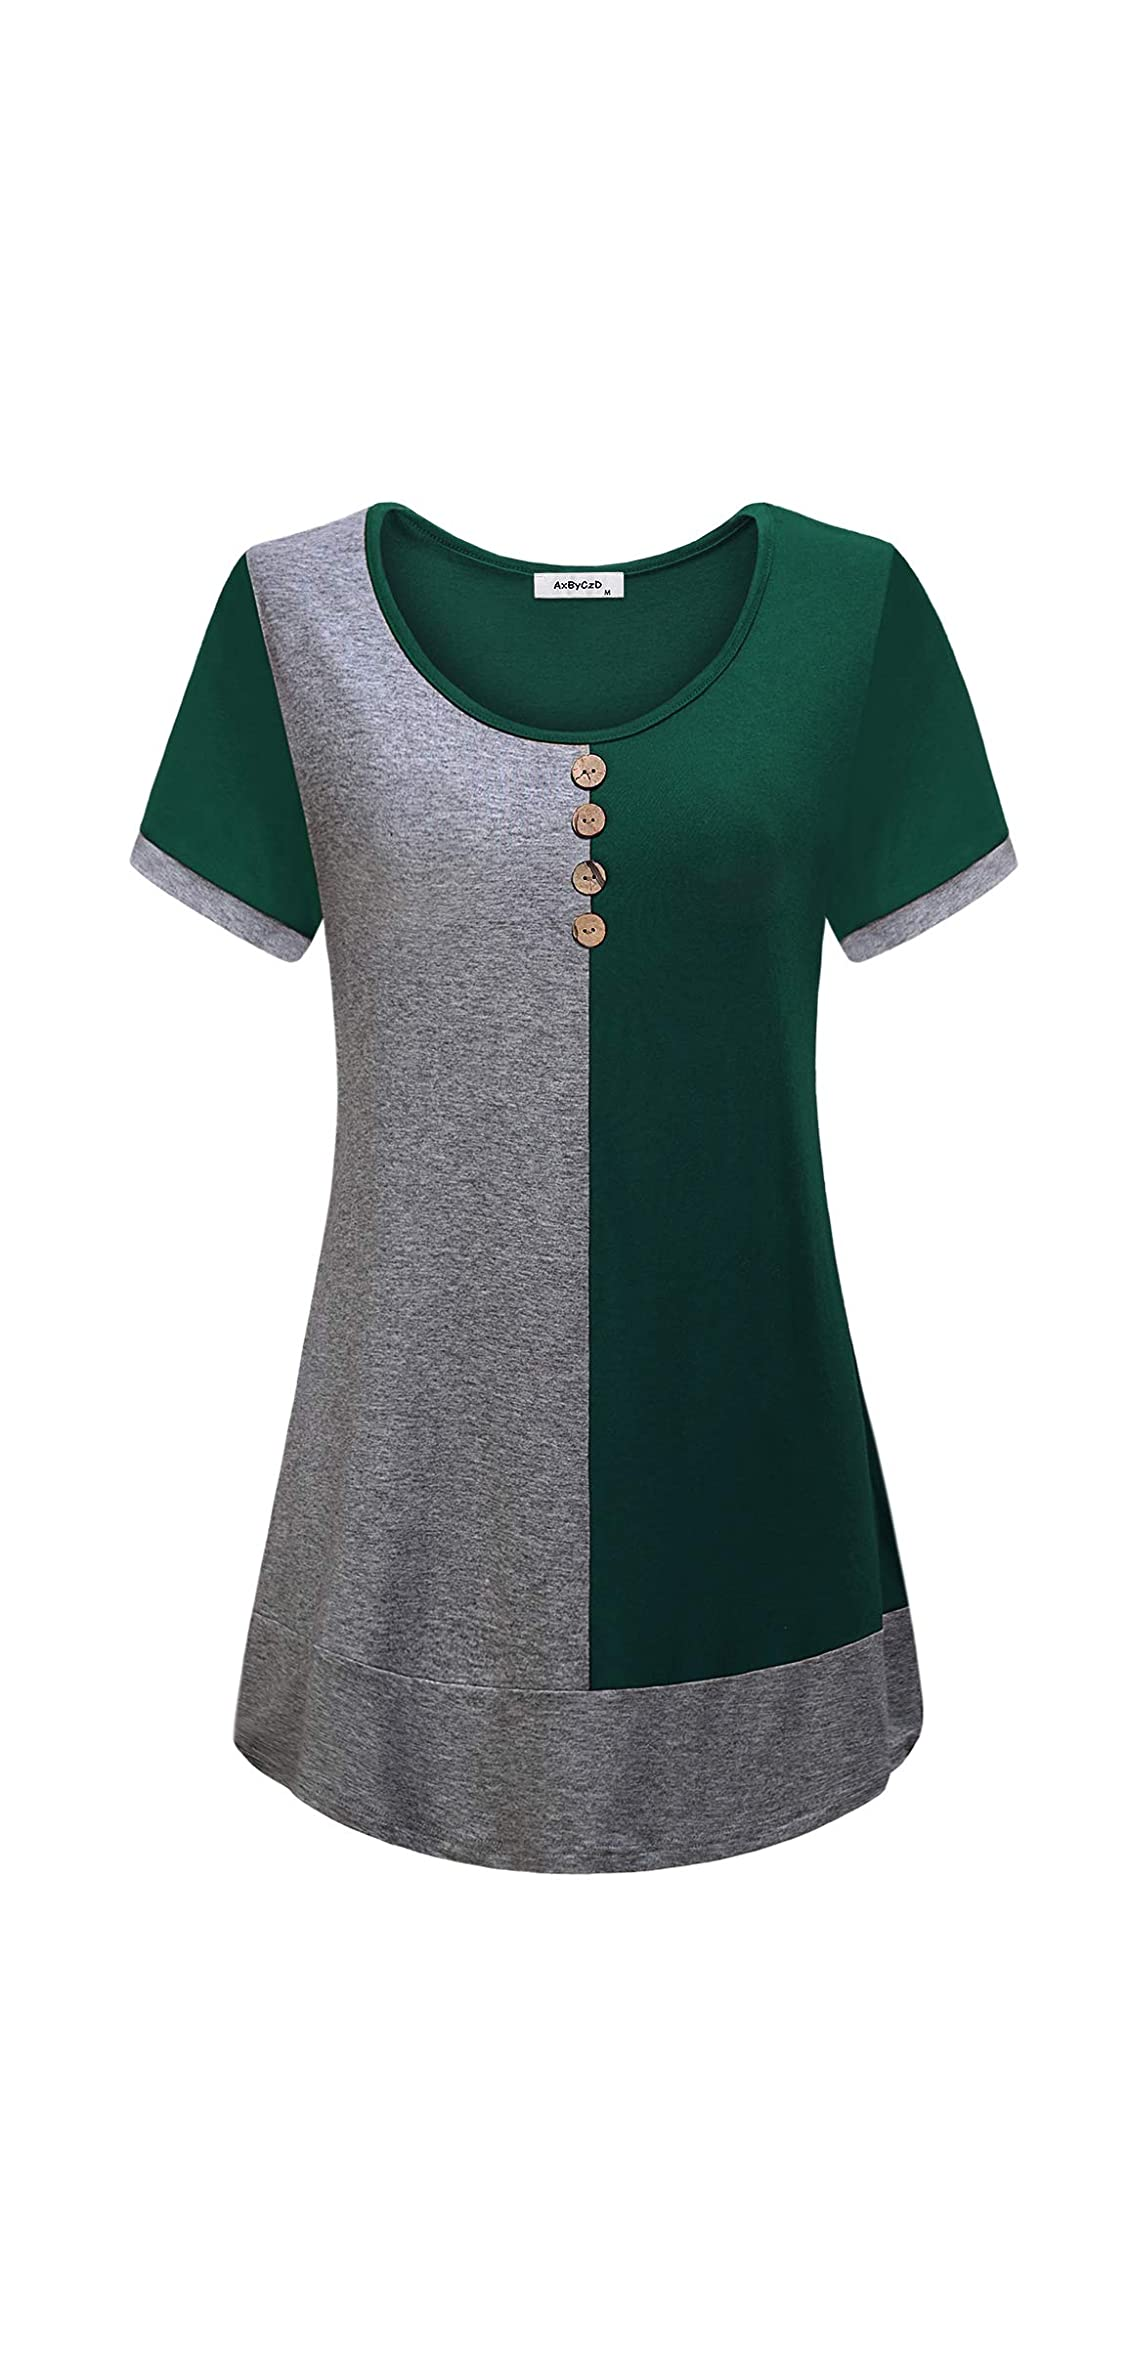 Women's Short Sleeve Round Neck Color Block Flare Tunic